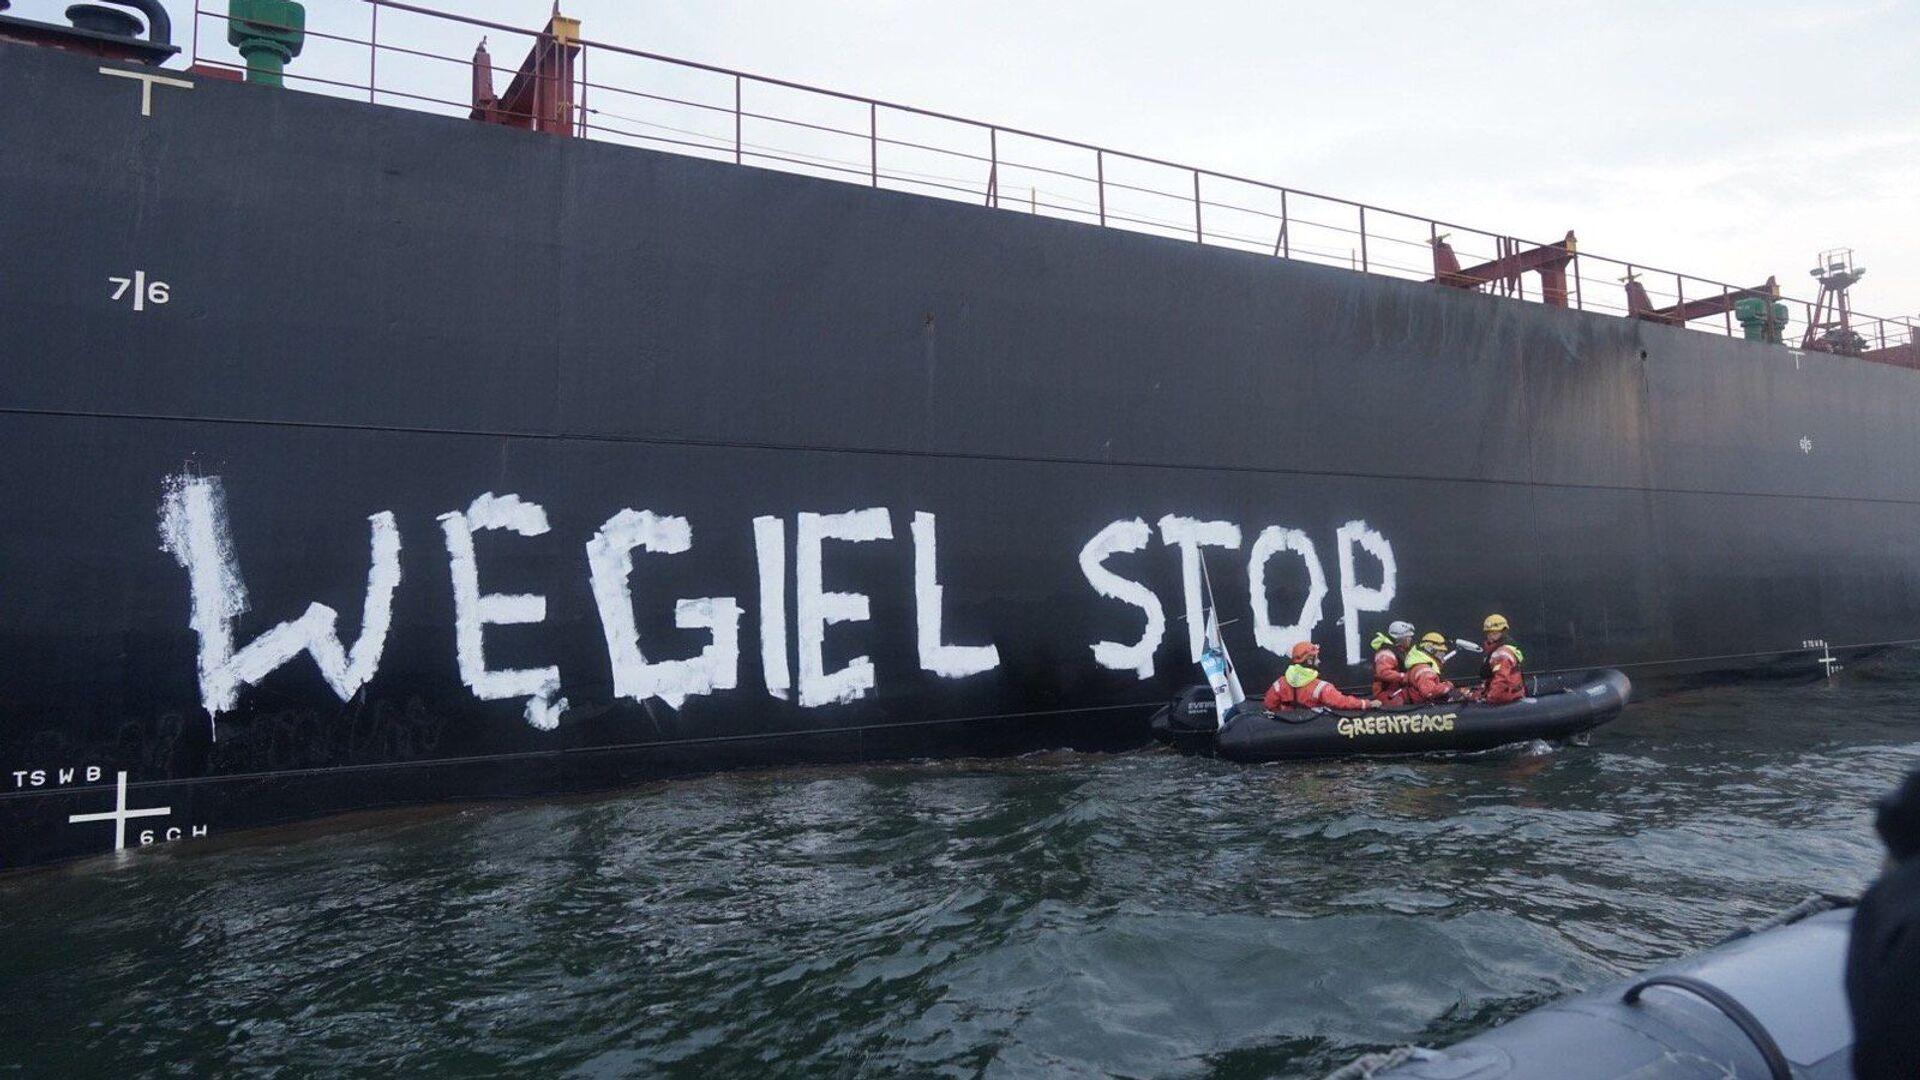 Protest Greenpeace - Węgiel stop - Sputnik Polska, 1920, 25.09.2021